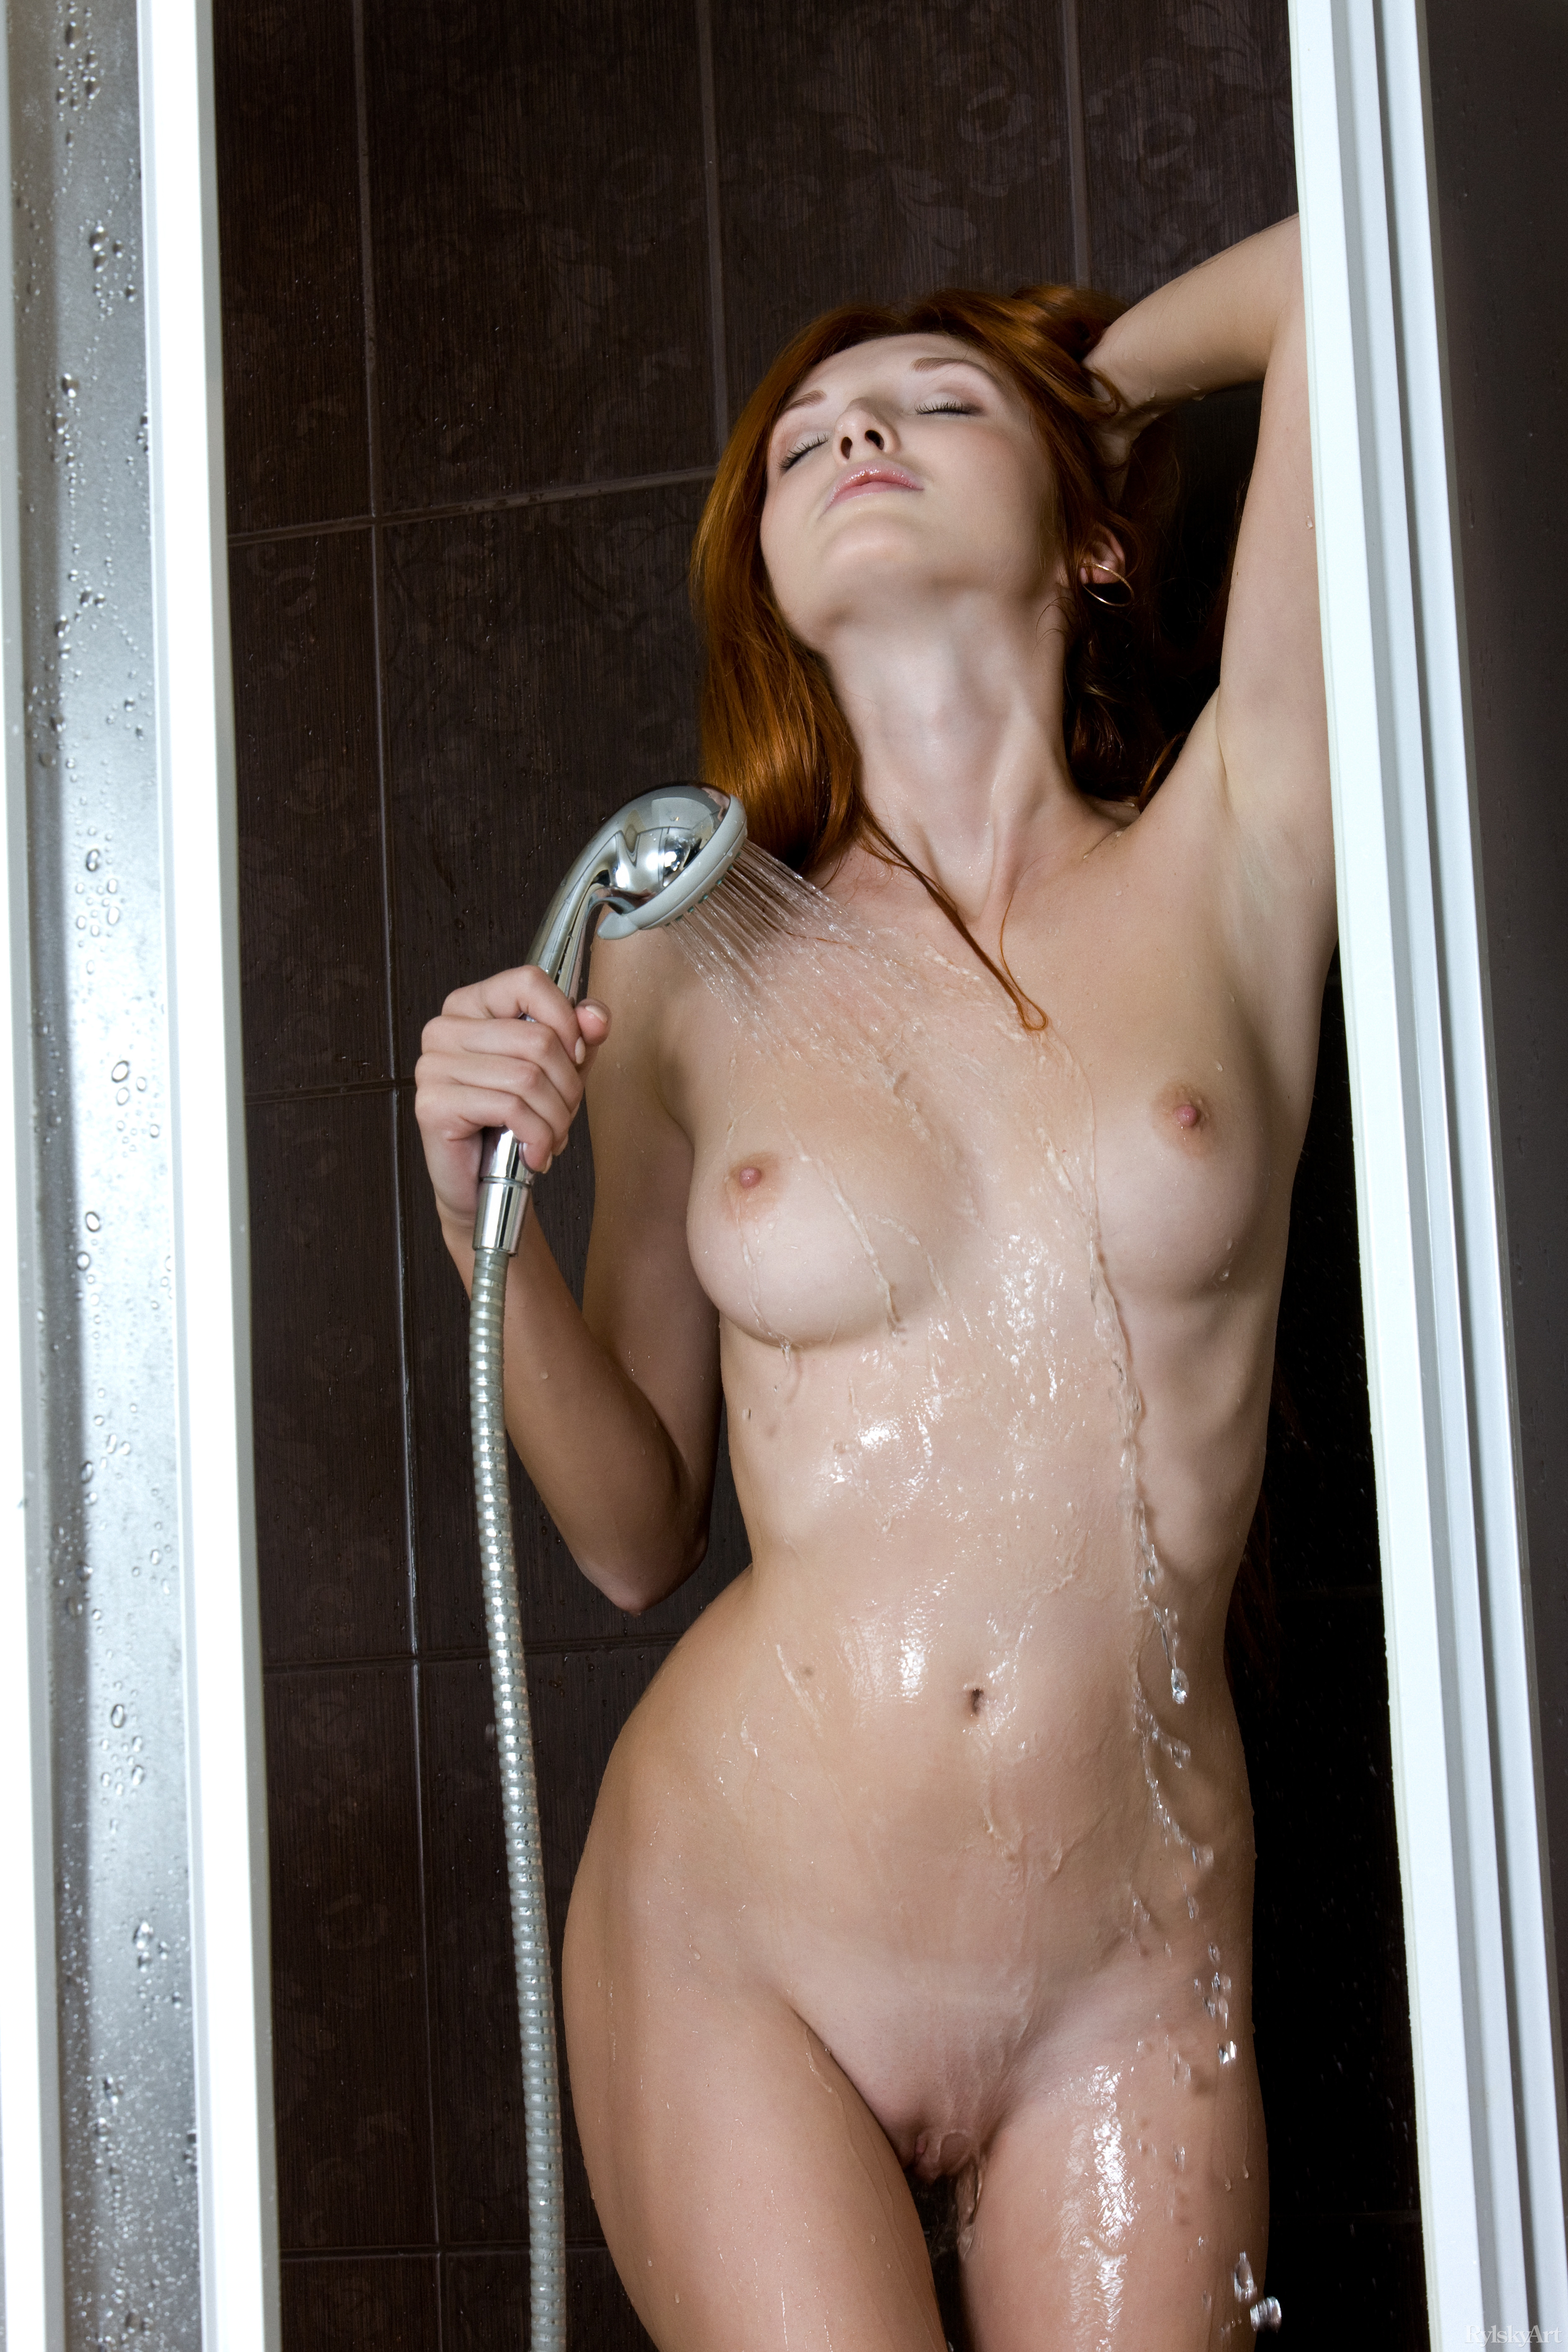 Подглядывание за девушками в бане душе badtour2ru Порно